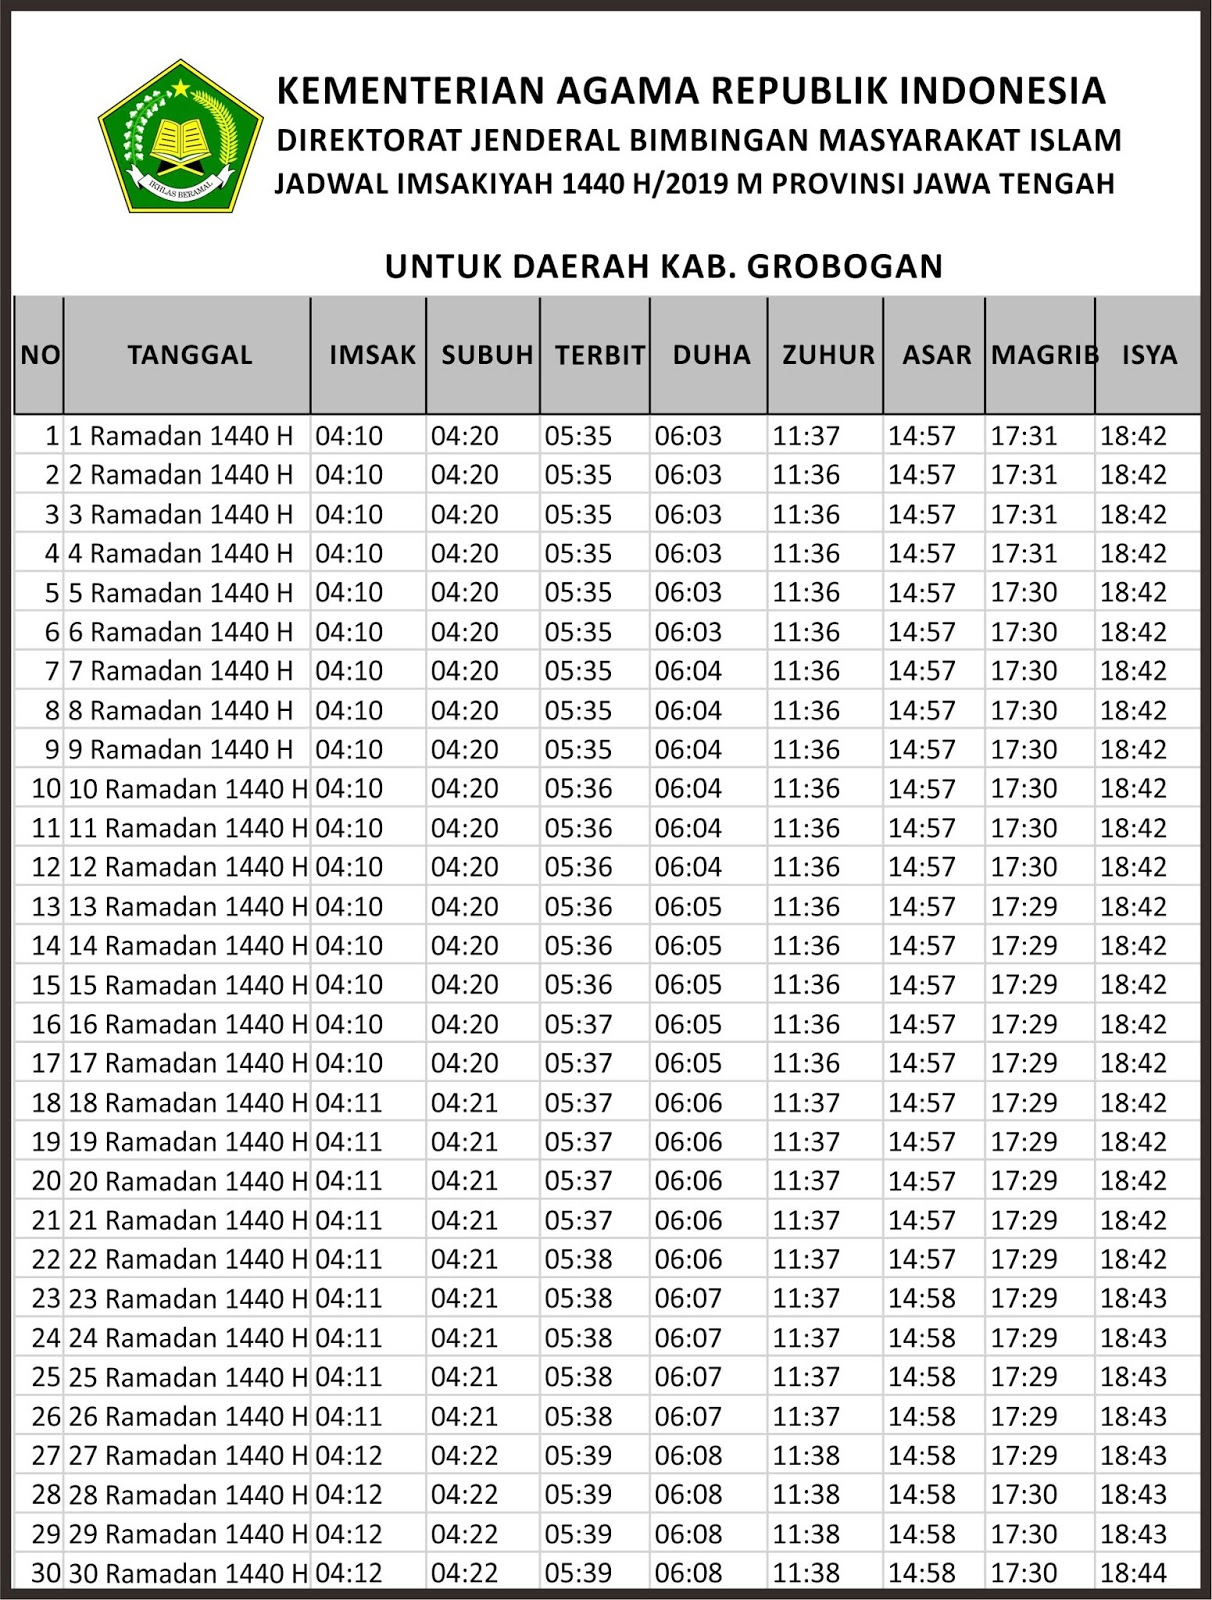 Jadwal Imsakiyah Puasa Ramadhan 2019 Kabupaten Grobogan